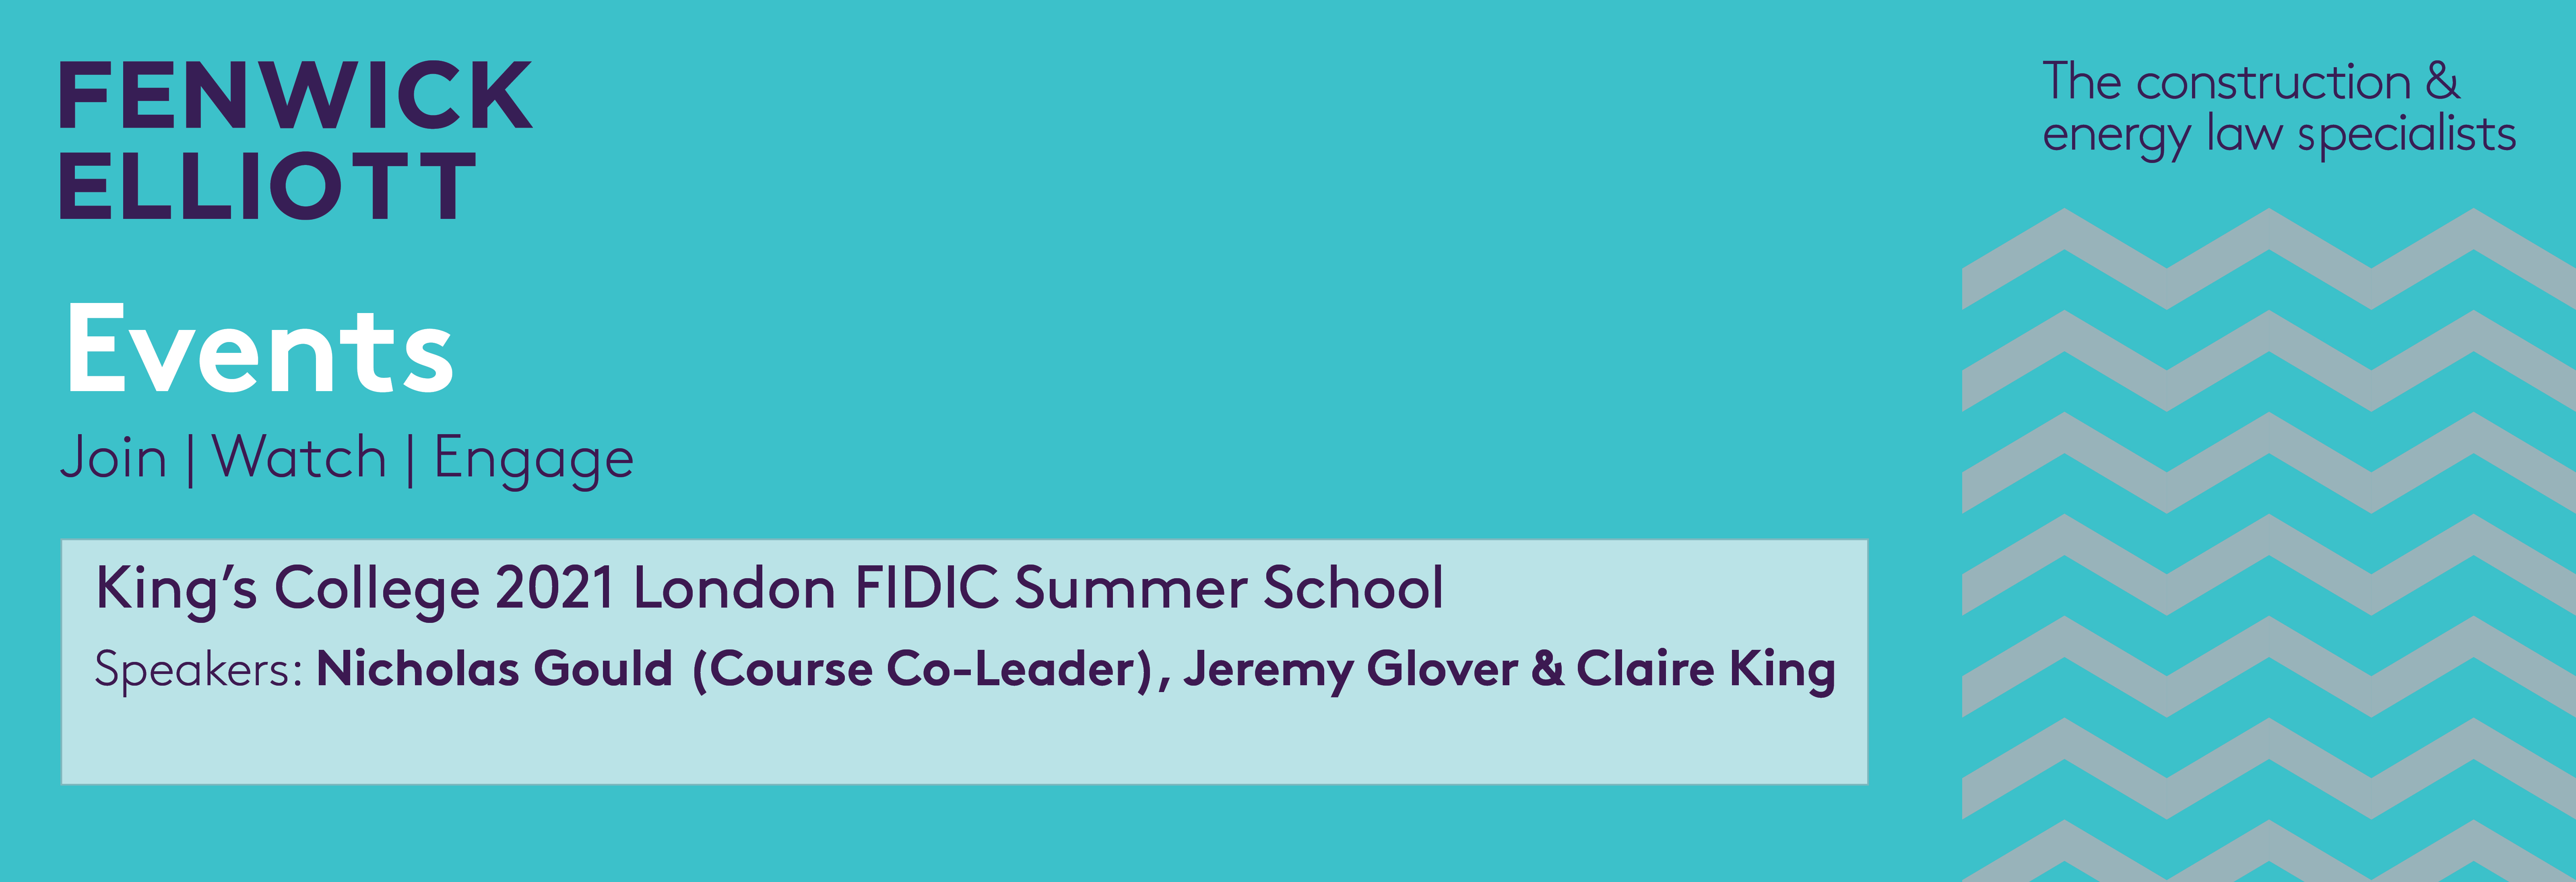 Kings College FIDIC Summer School 2021